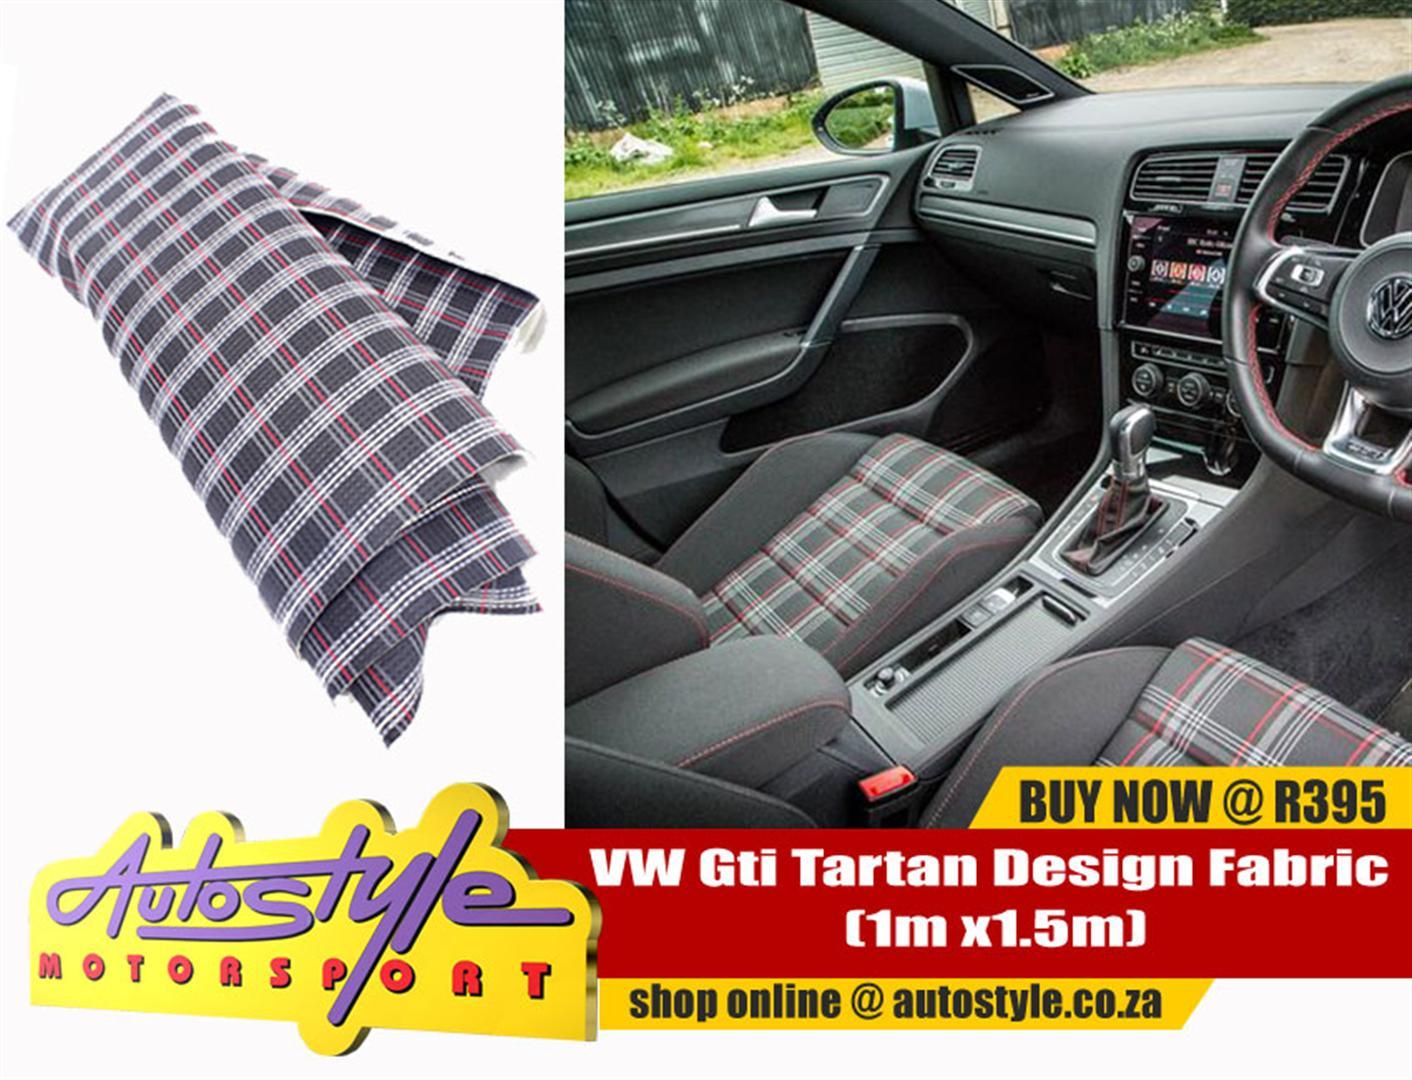 VW  golf Gti Tartan Design Fabric (1m x1.5m)